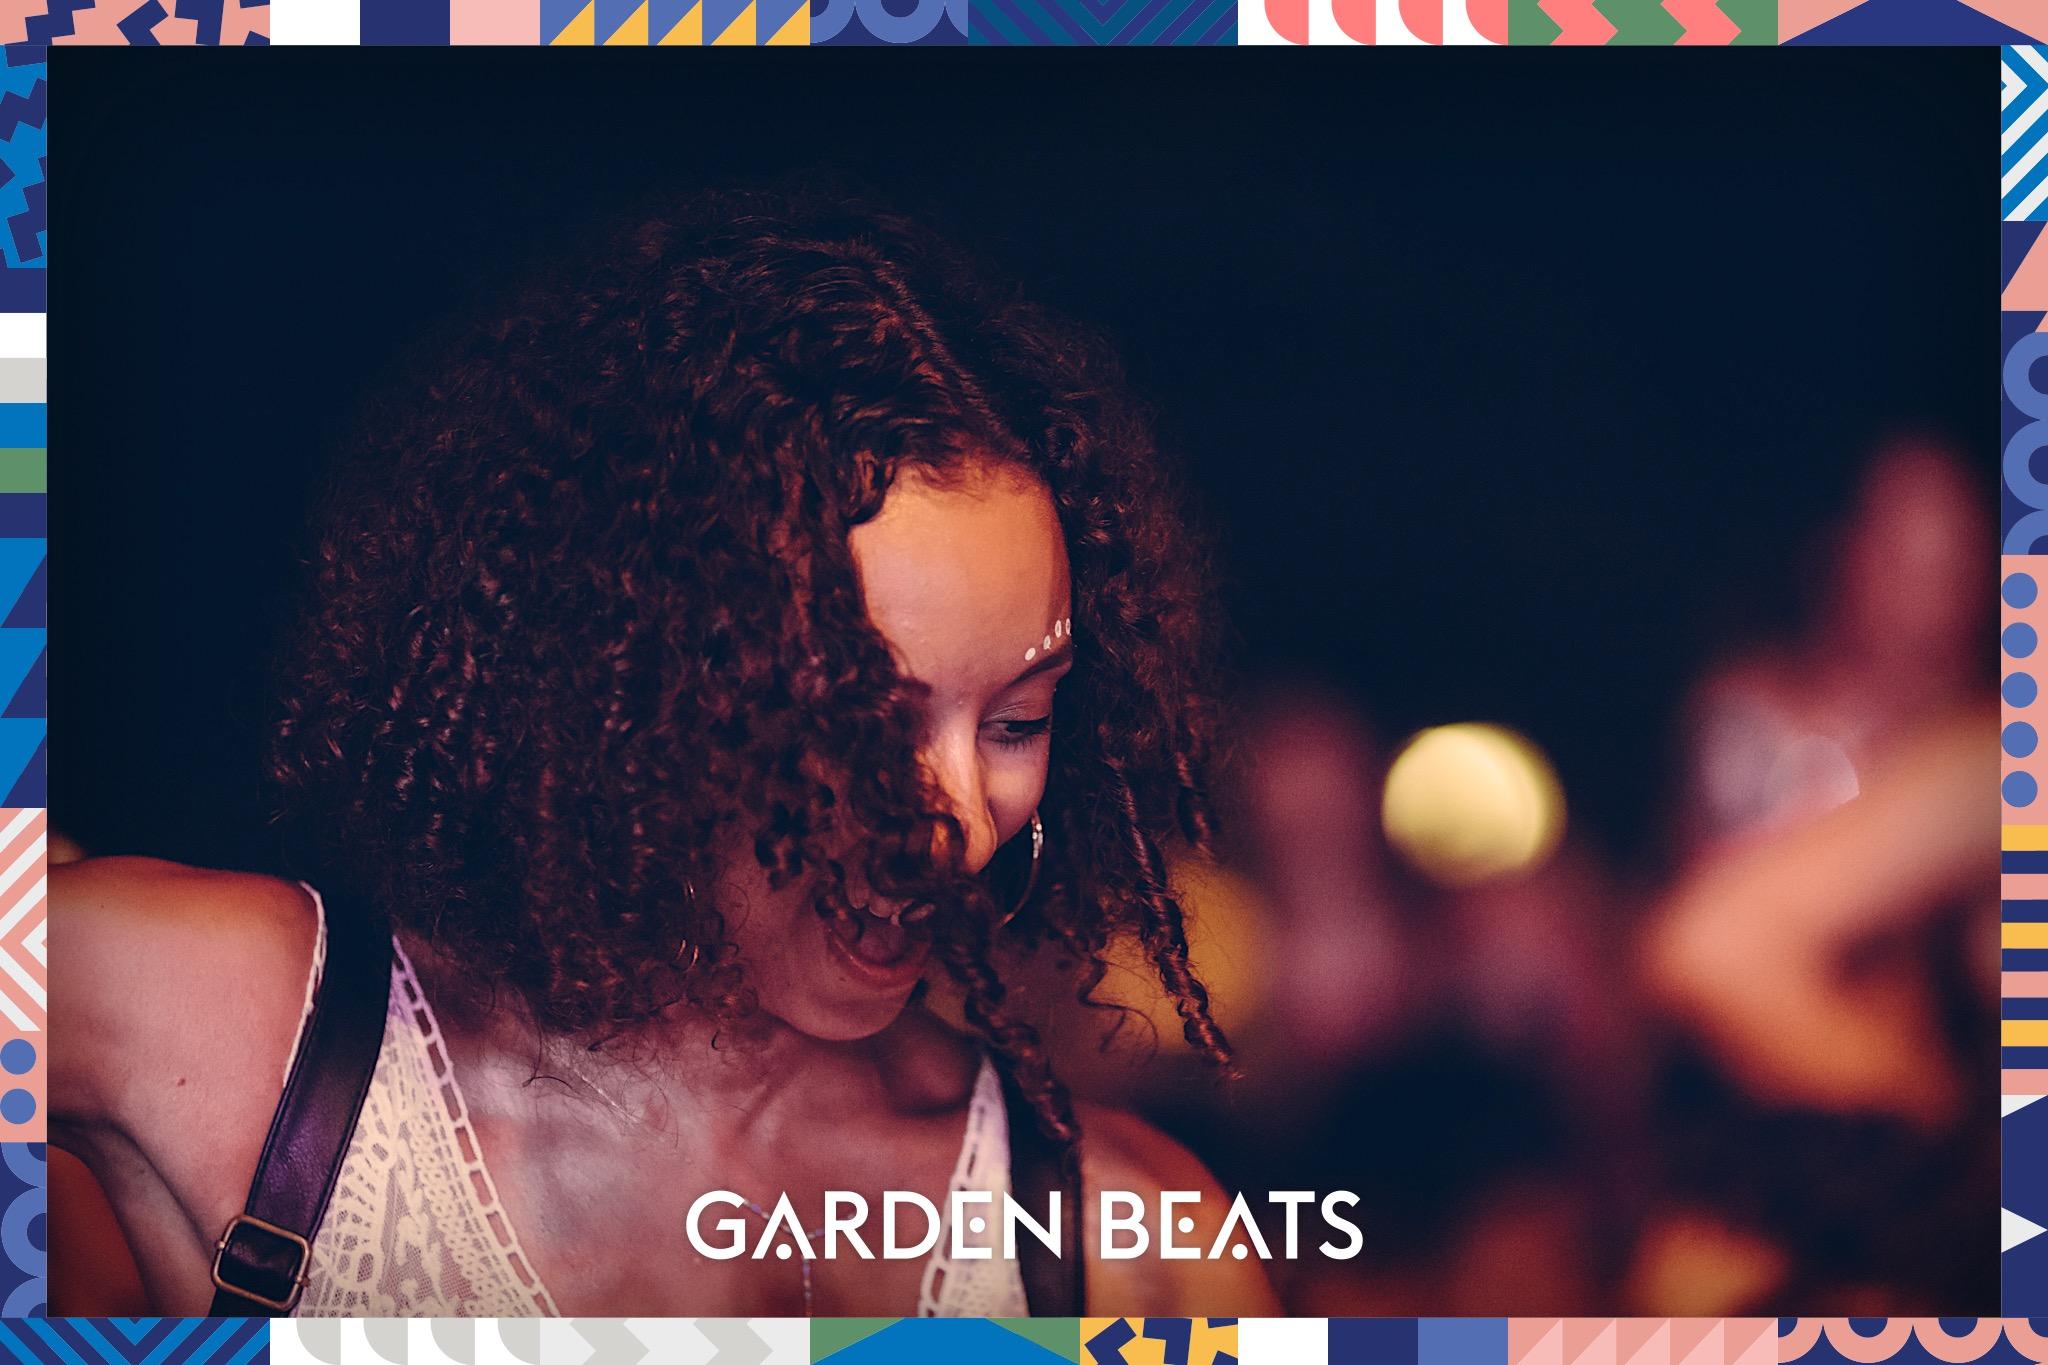 18032017_GardenBeats_Colossal801_WatermarkedGB.jpg